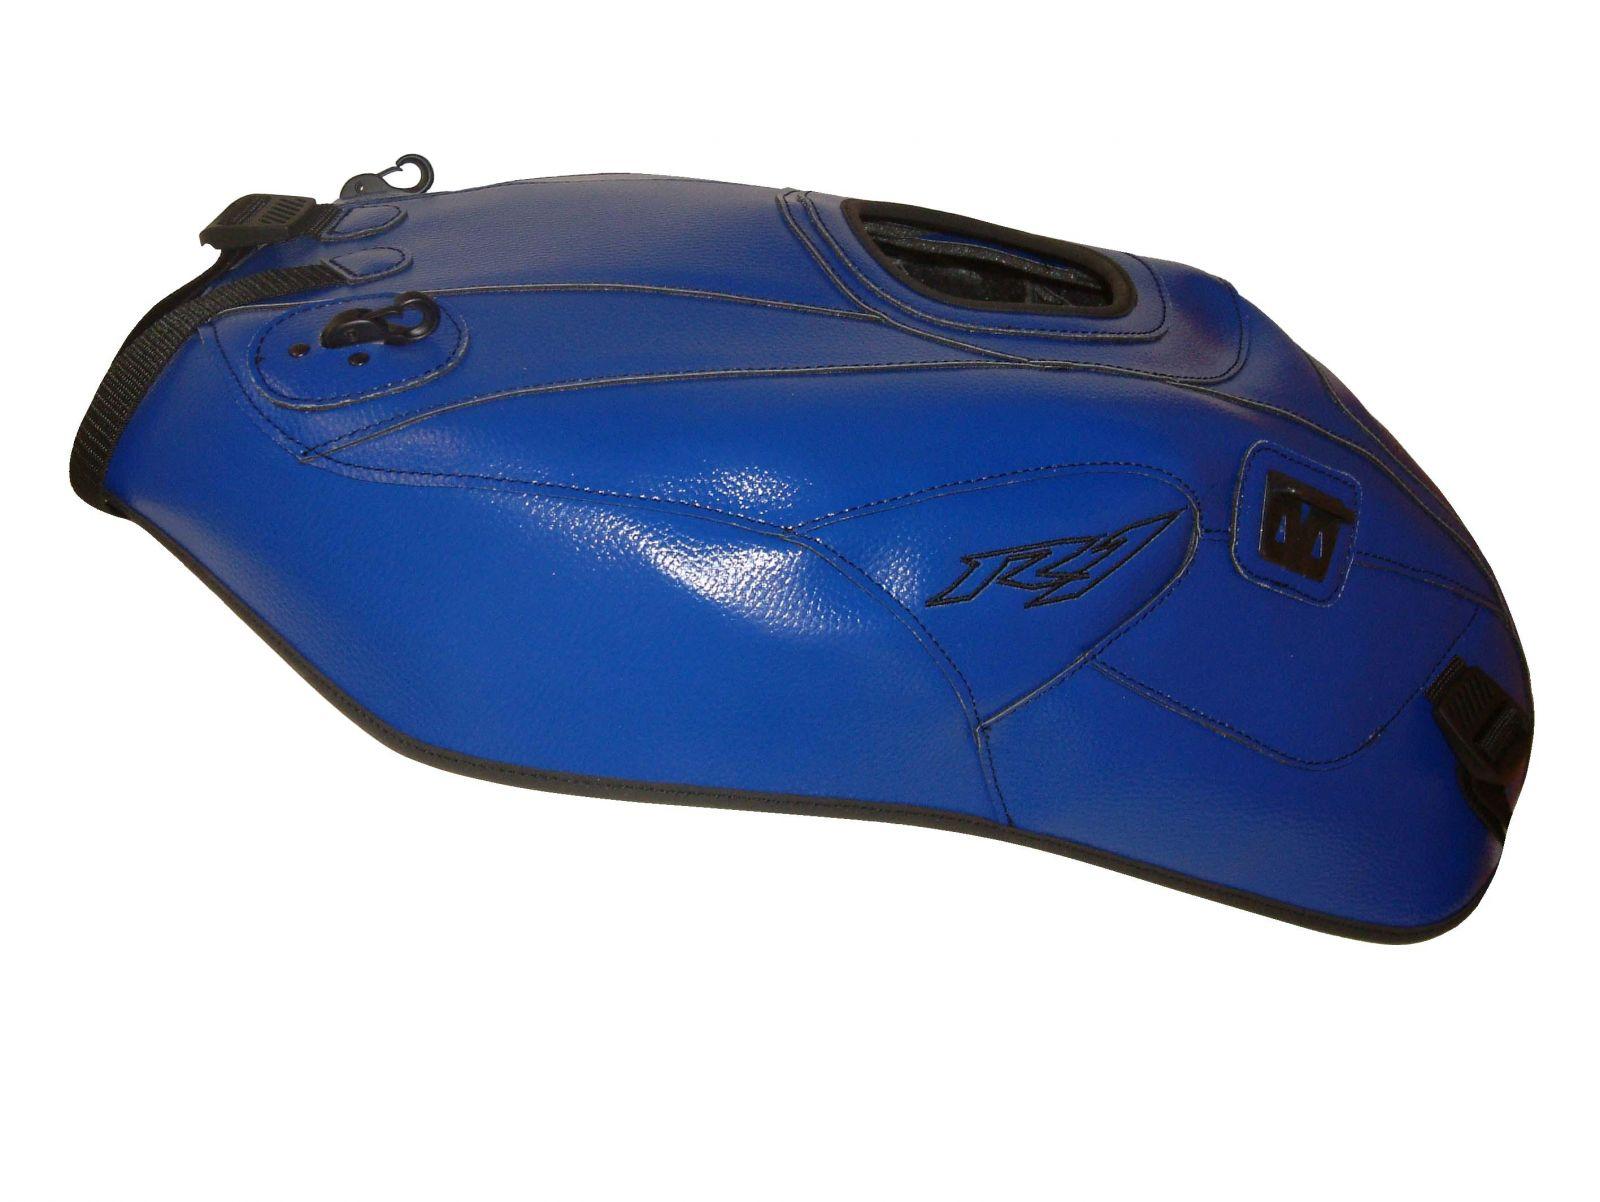 Capa de depósito TPR5996 - YAMAHA YZF R1 [2009-2010]